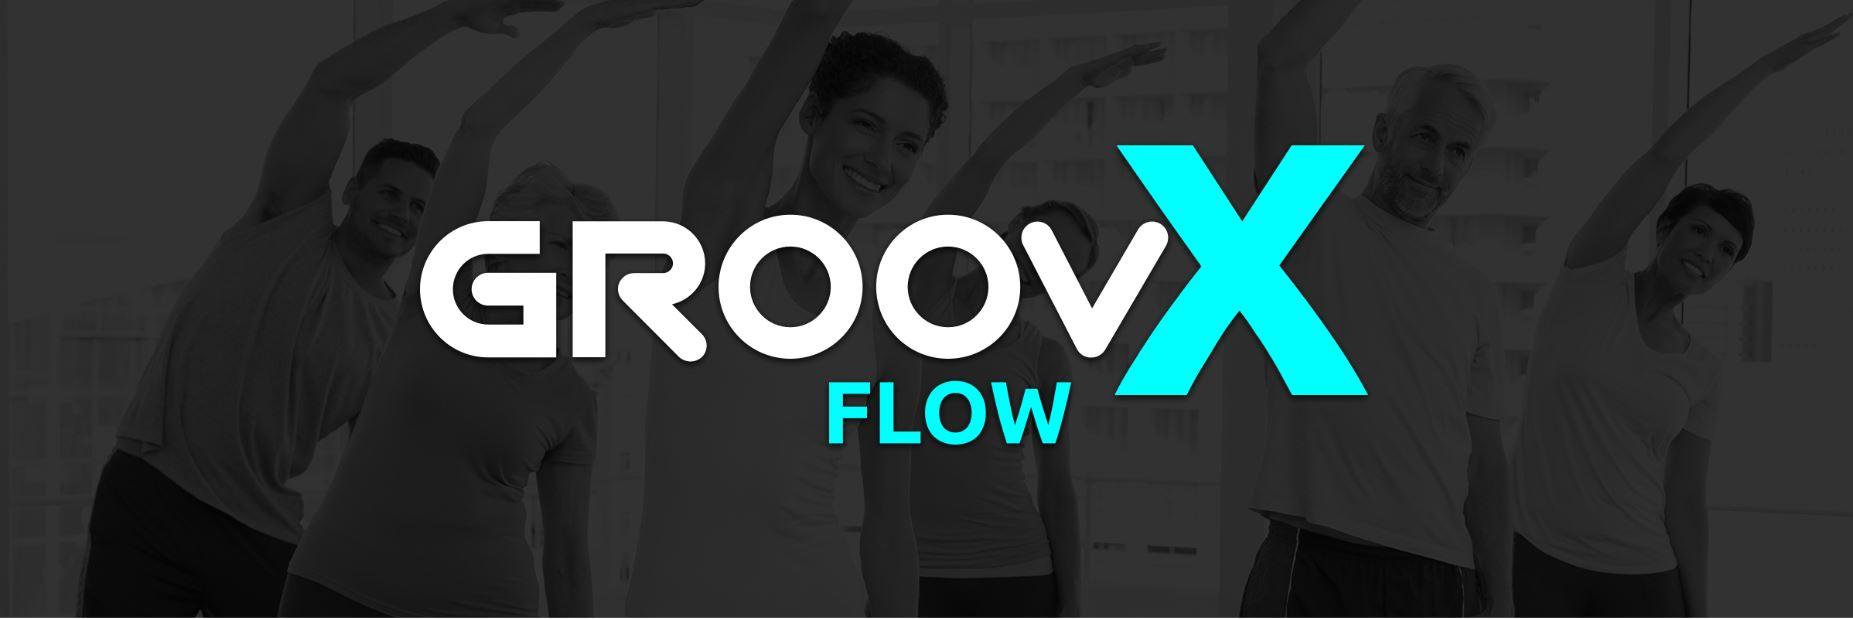 Groovx flow logo web